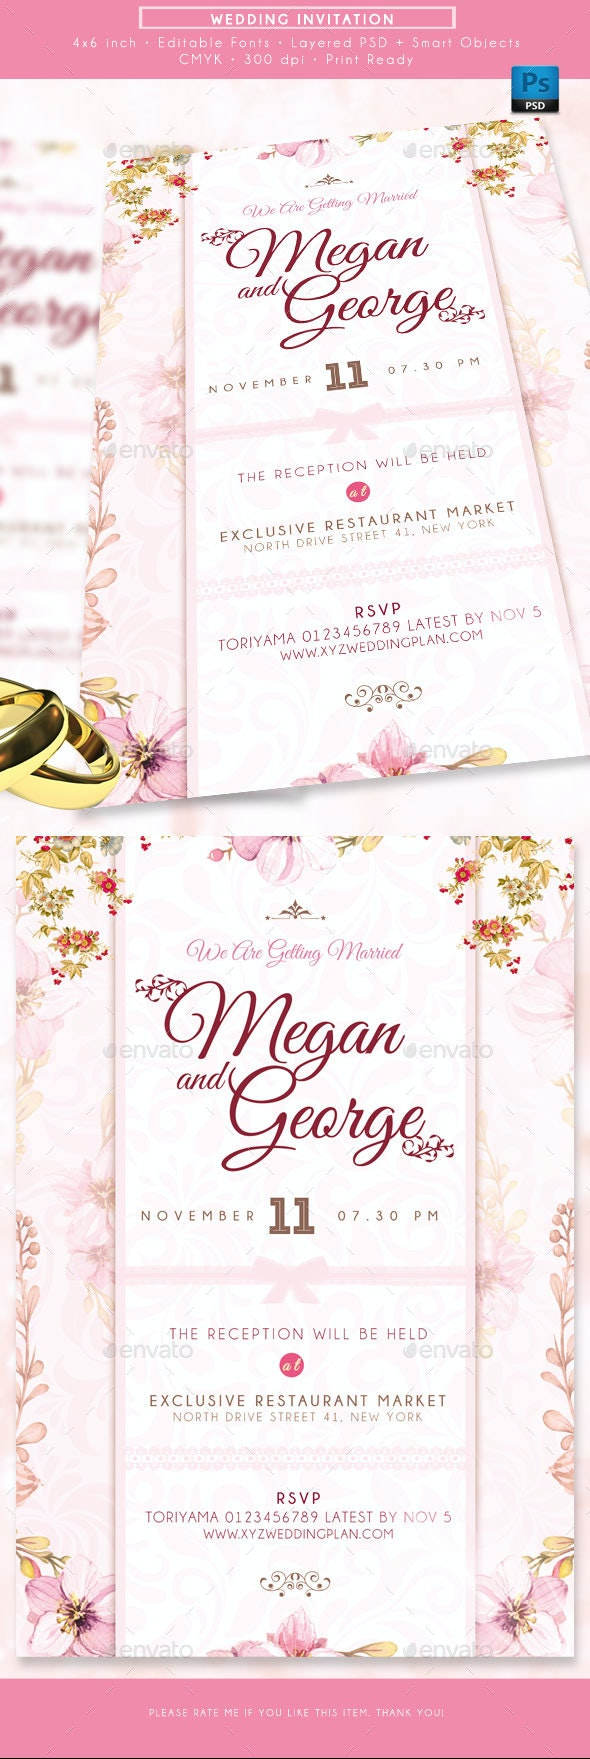 Wedding Invitations - Weddings Cards & Invites